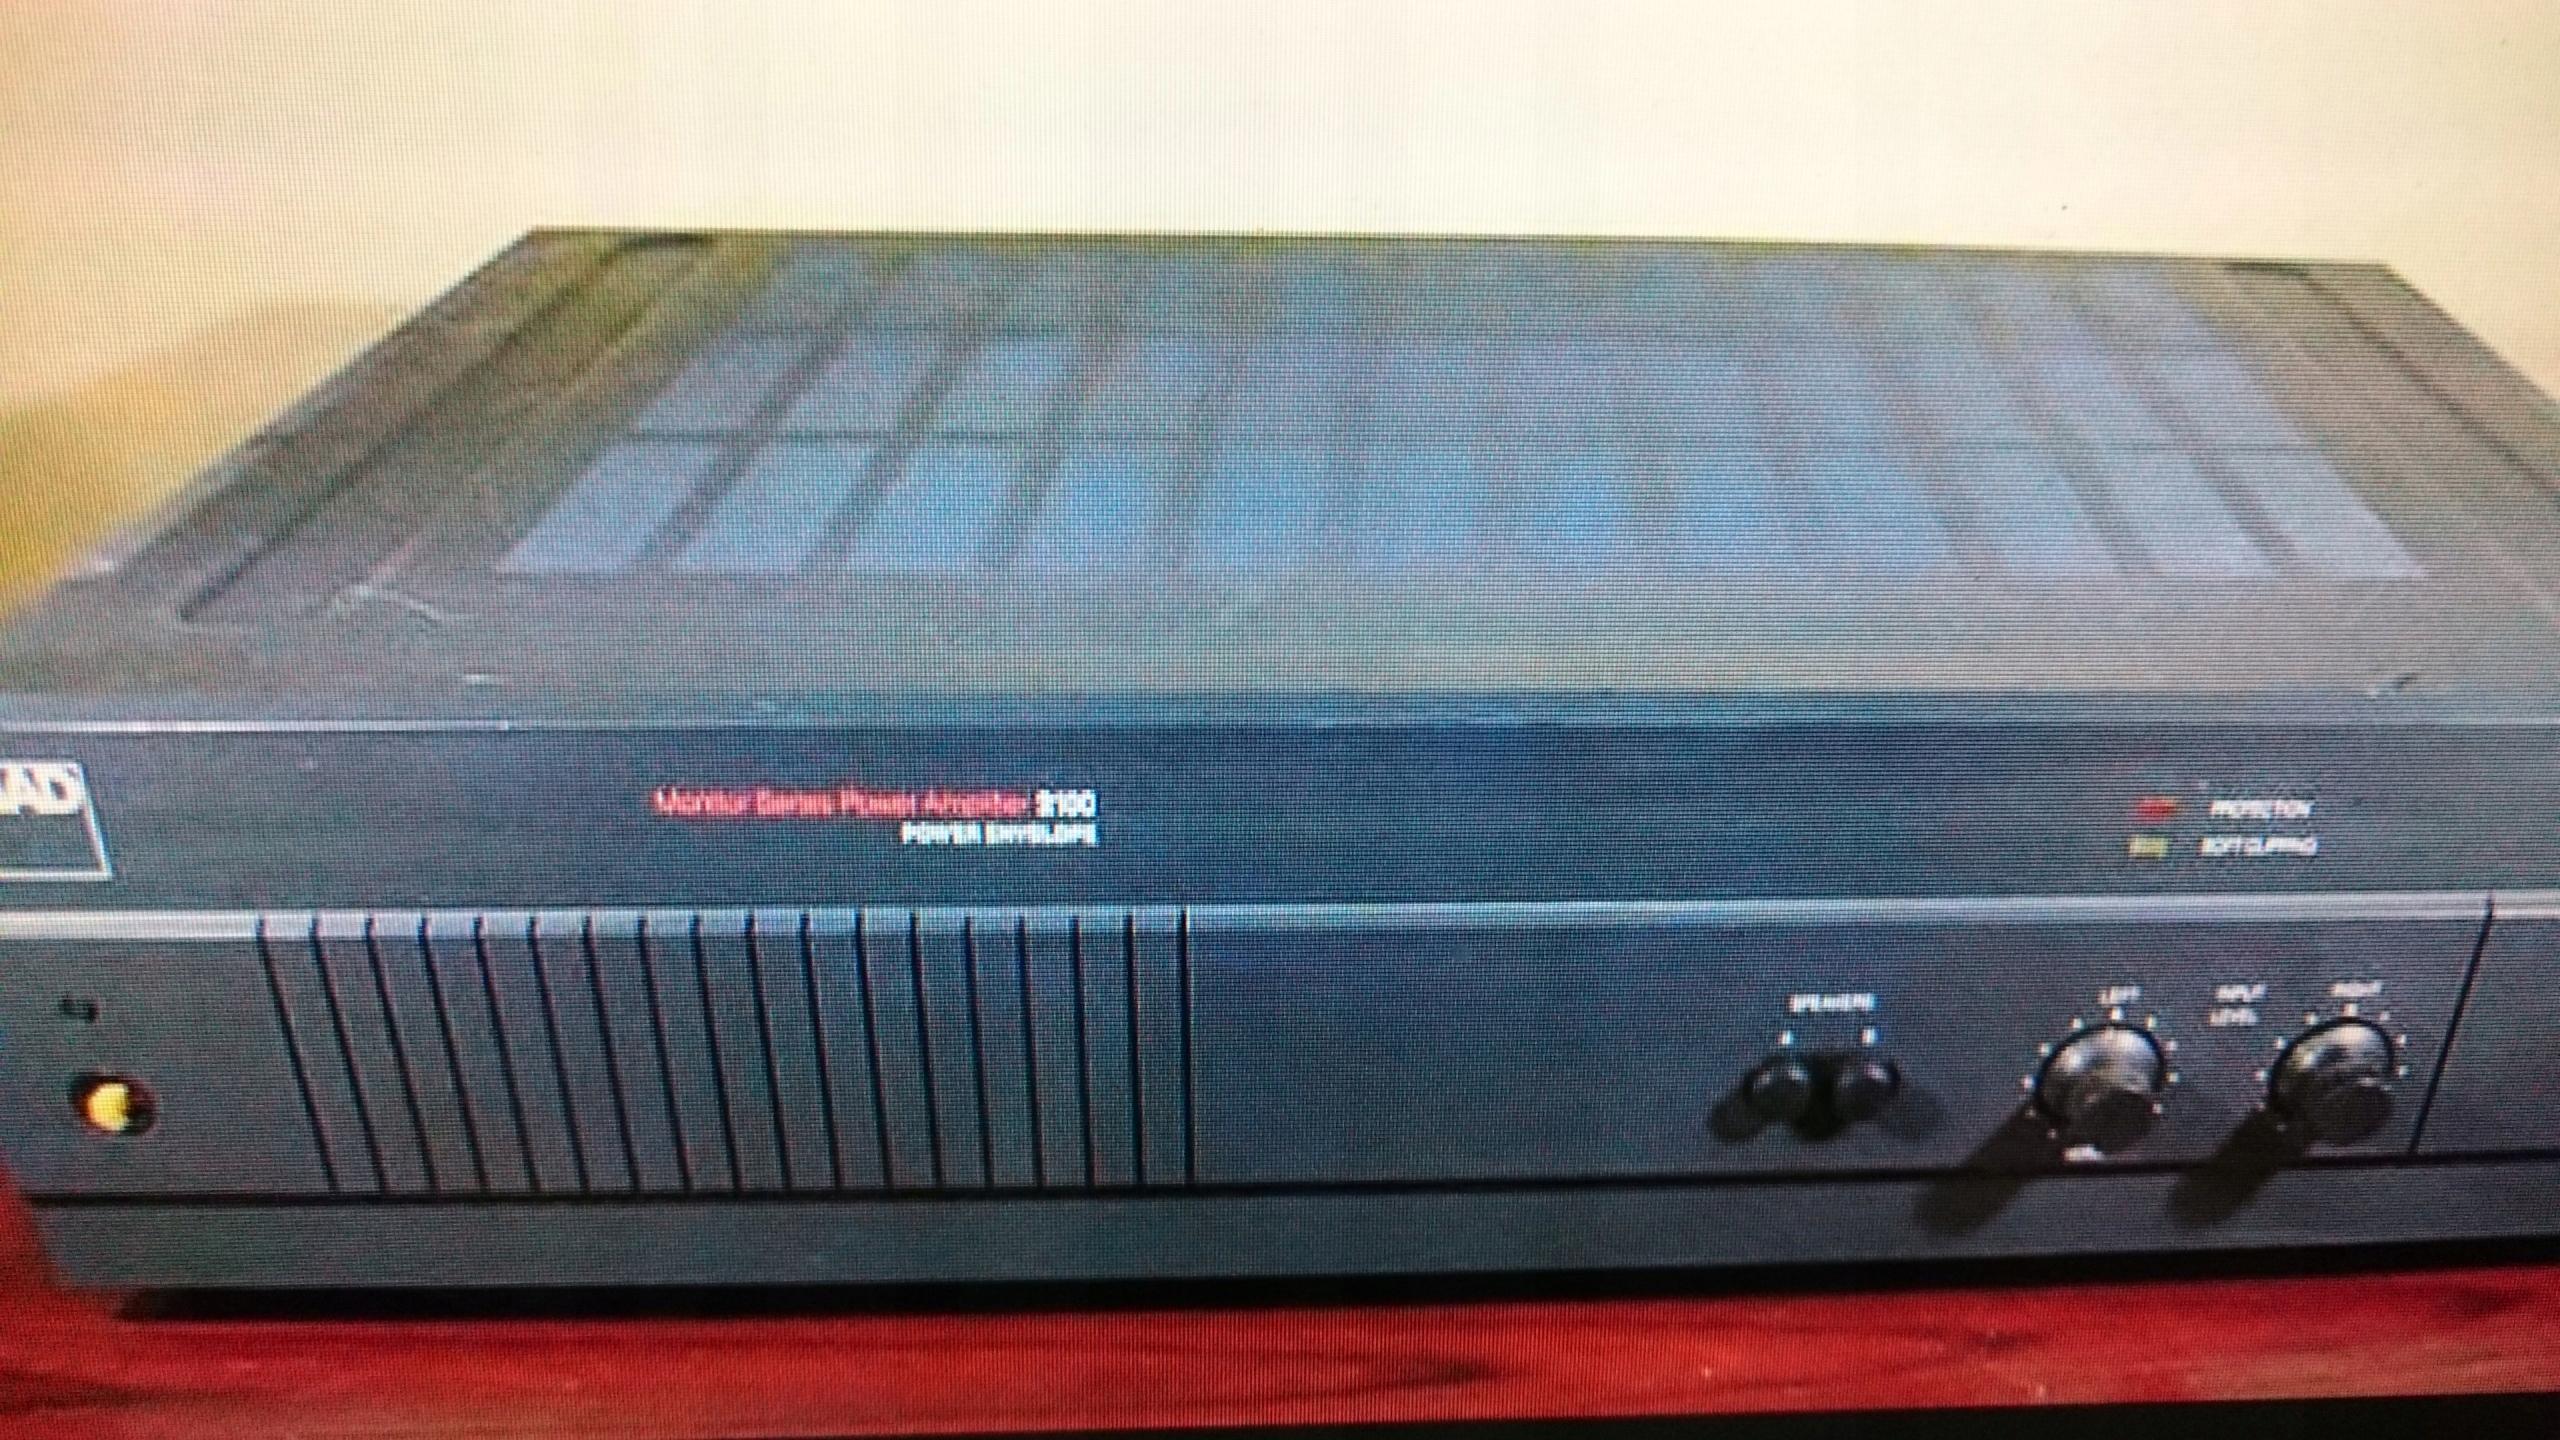 NAD 2100+ phono preamp  Legenda  Sn 117db